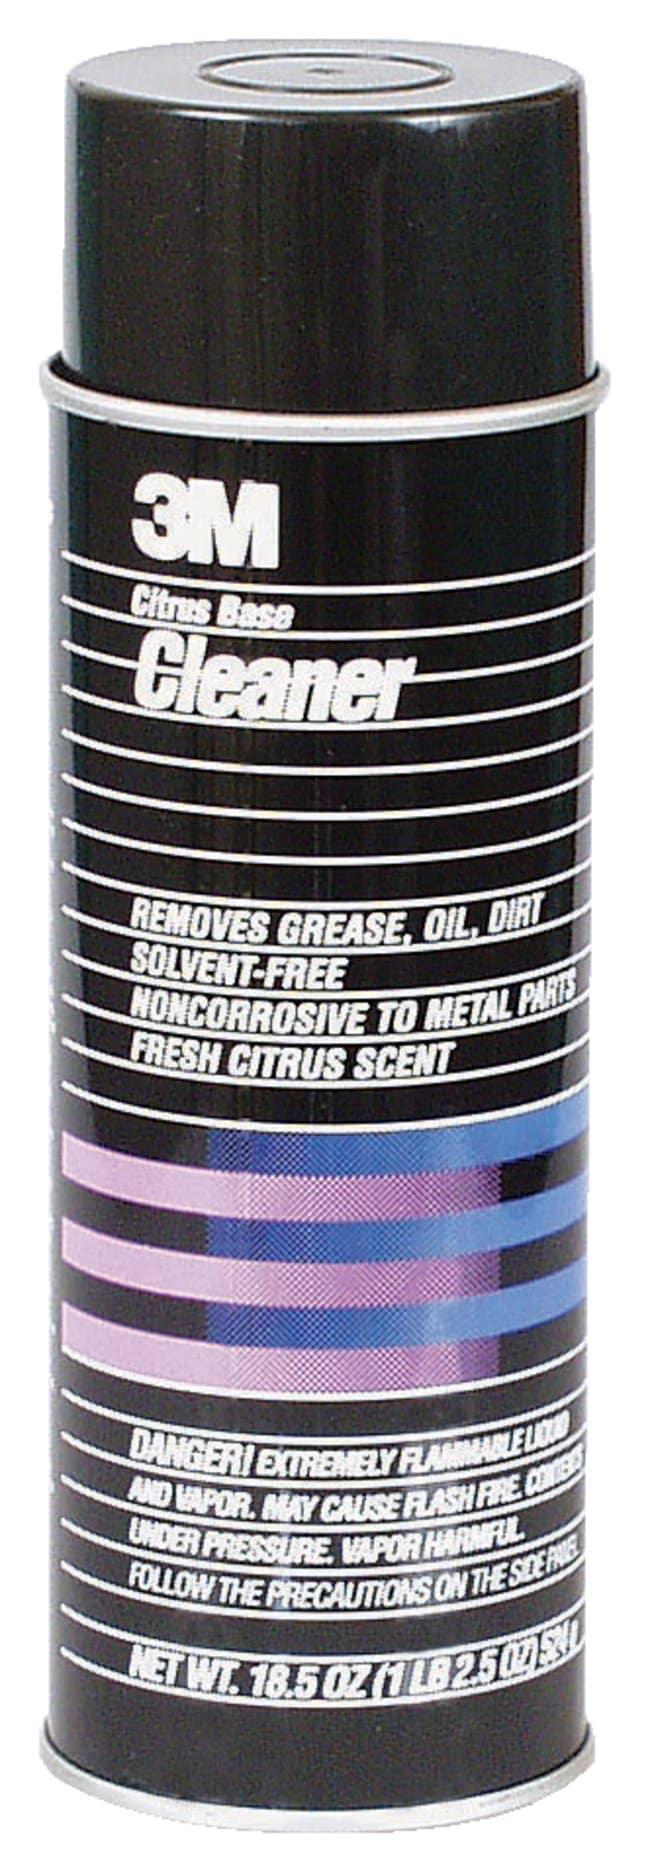 3M Citrus Base Cleaner Citrus-oil base; Fresh citrus scent; 710mL:Gloves,